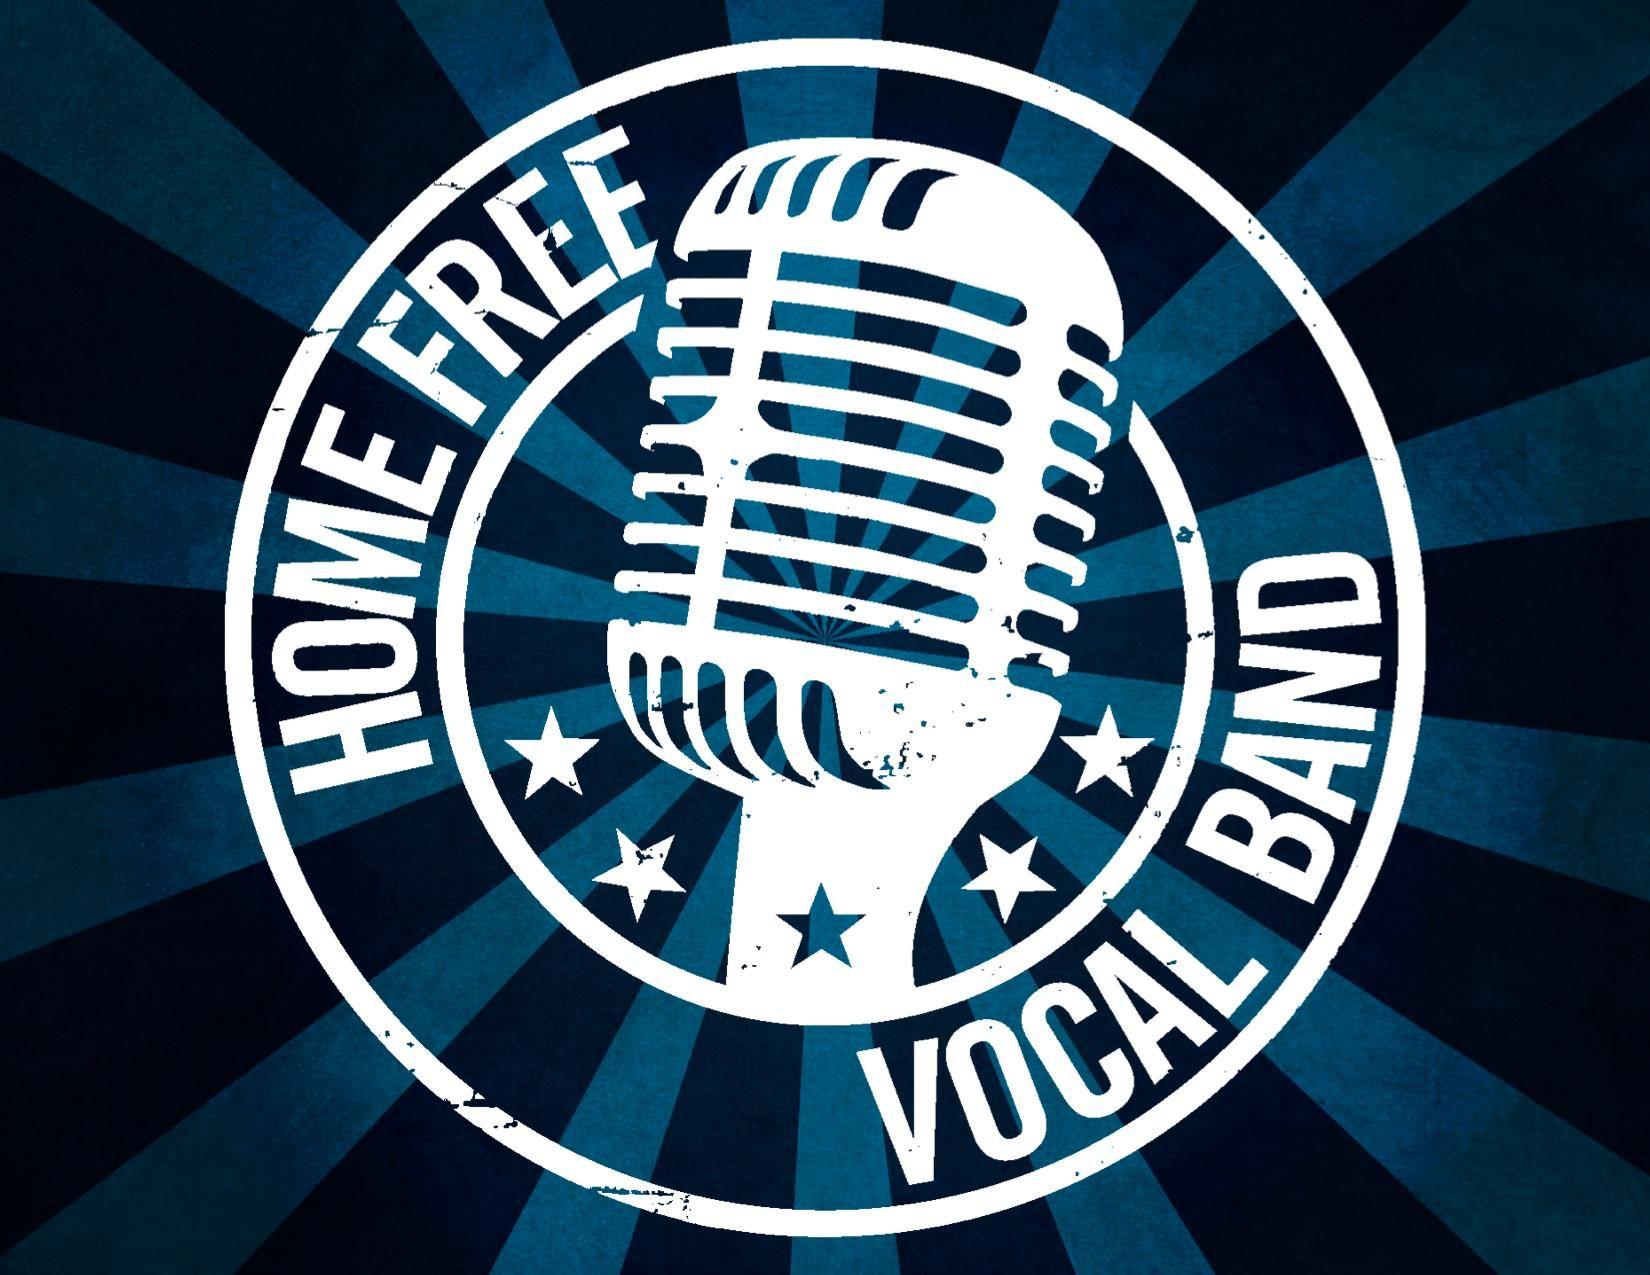 Home Free Logo | Home free vocal band, A cappella, Home free